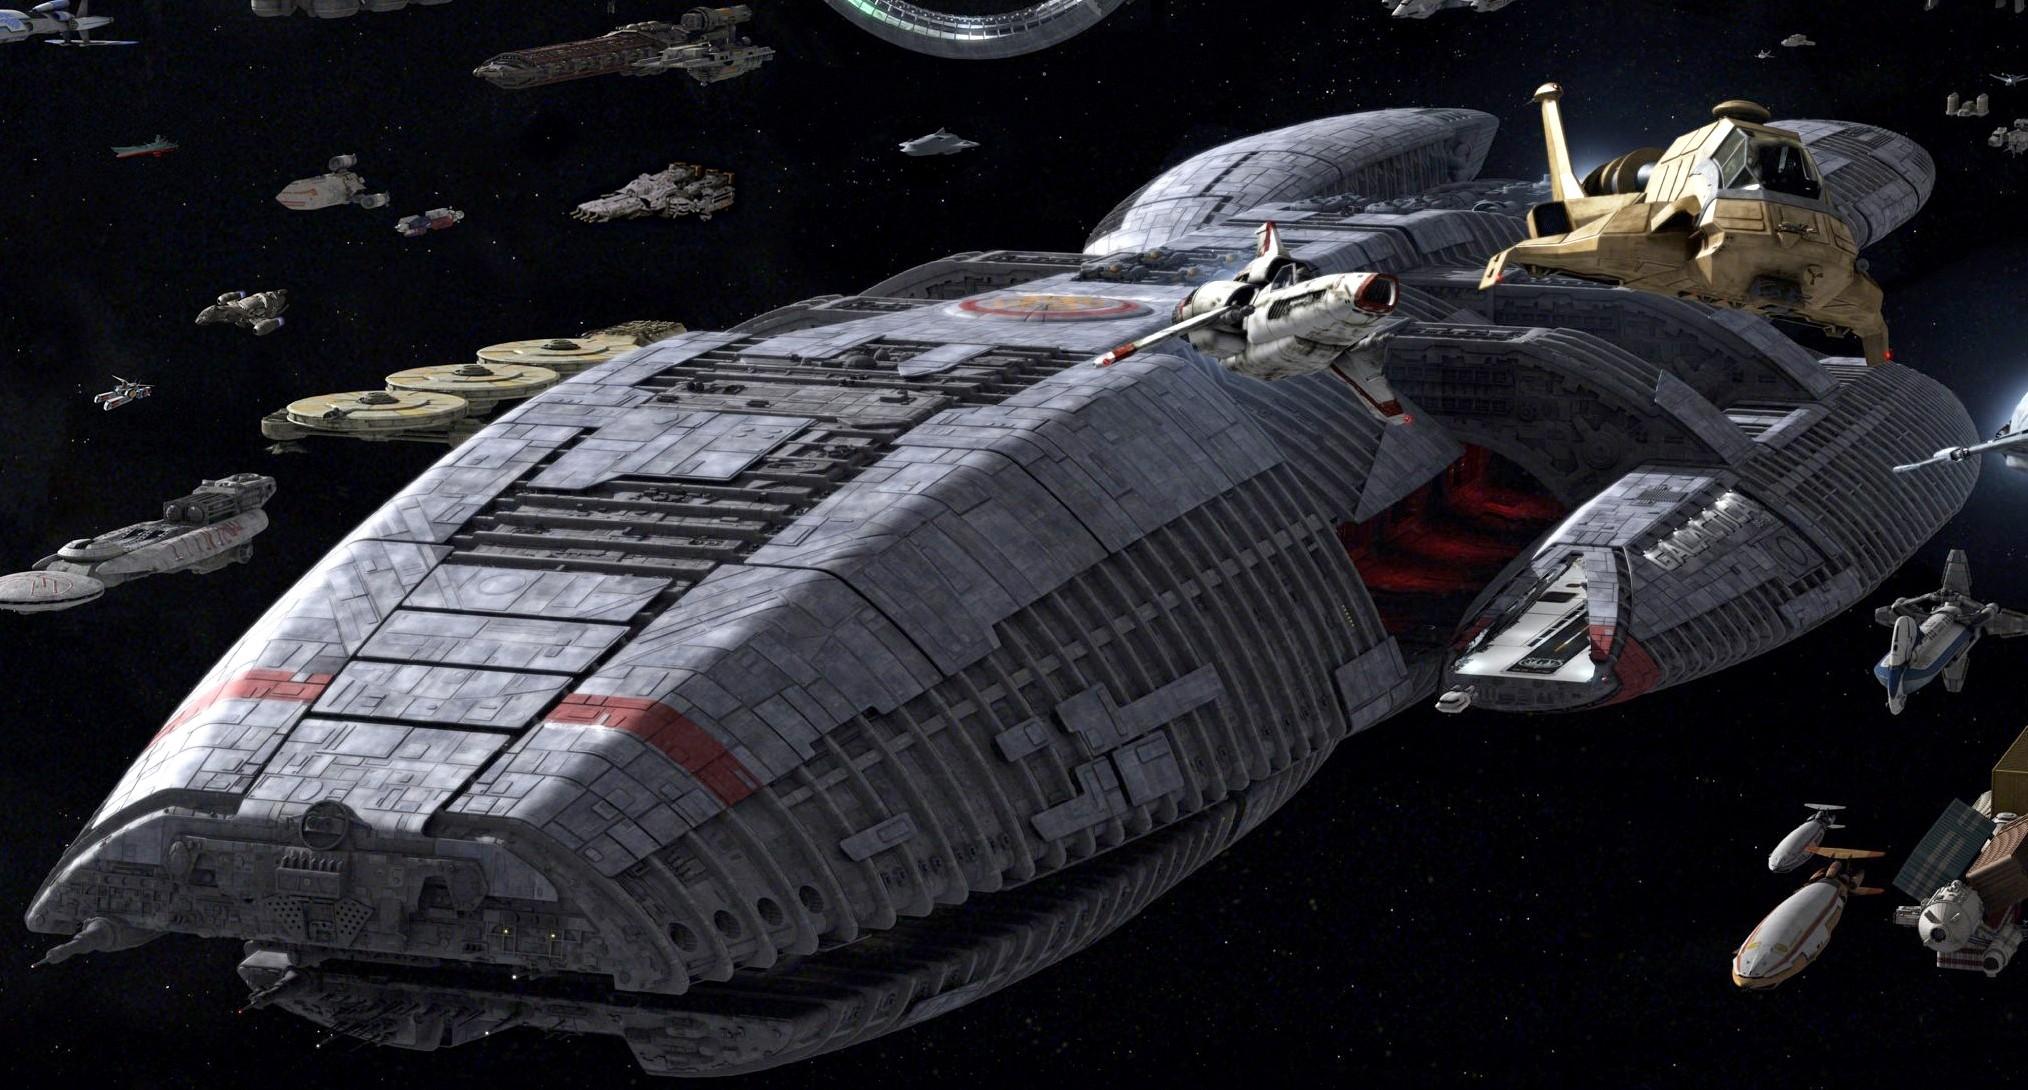 Firefly Battlestar Galactica Andromeda Hd | HD Walls | Find Wallpapers .